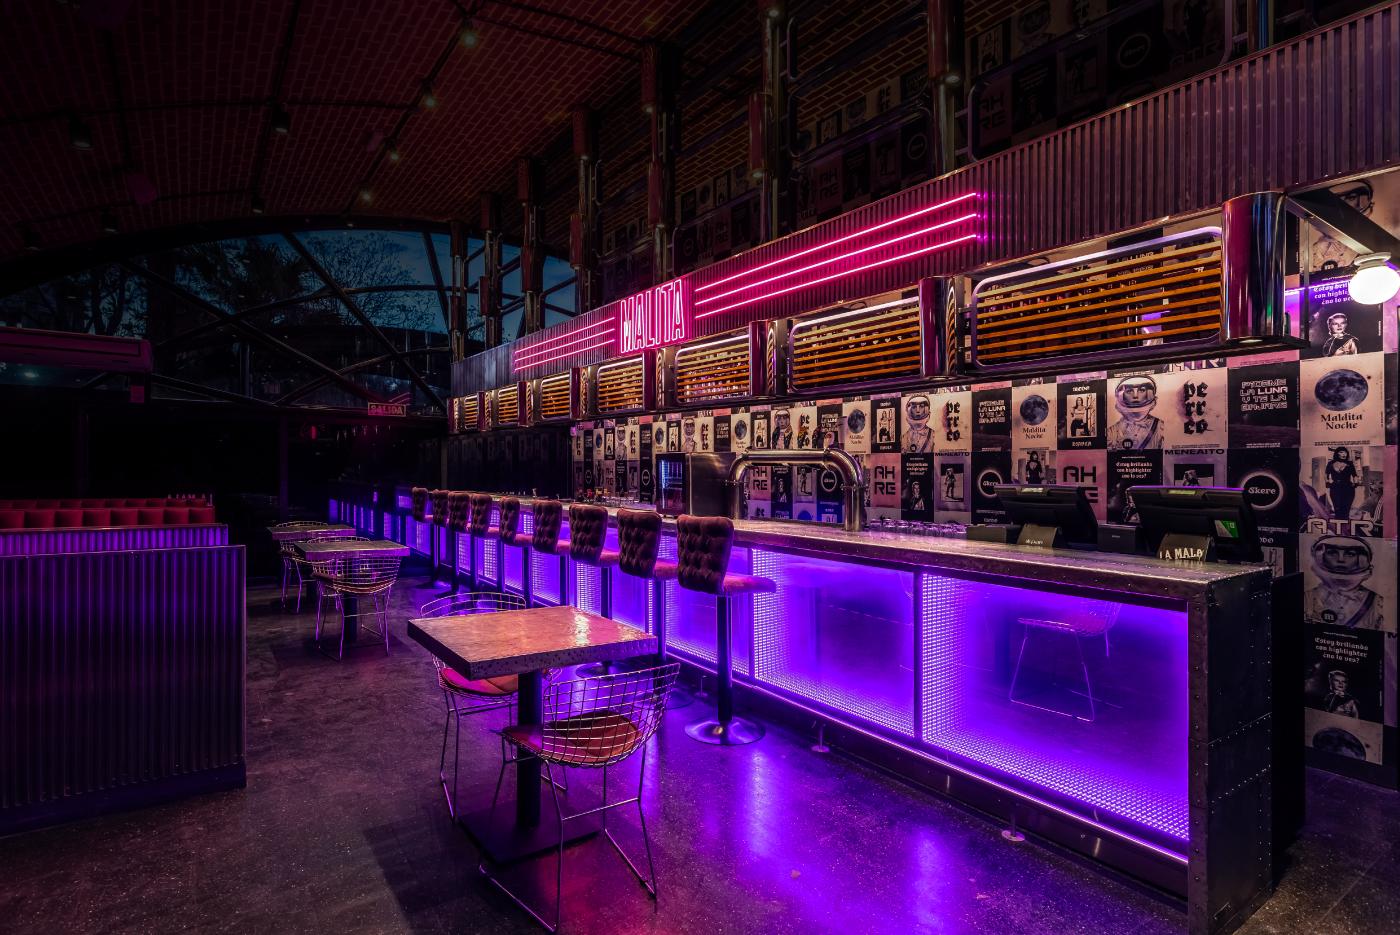 Branding & Full Visual Identity for La Mala Pub